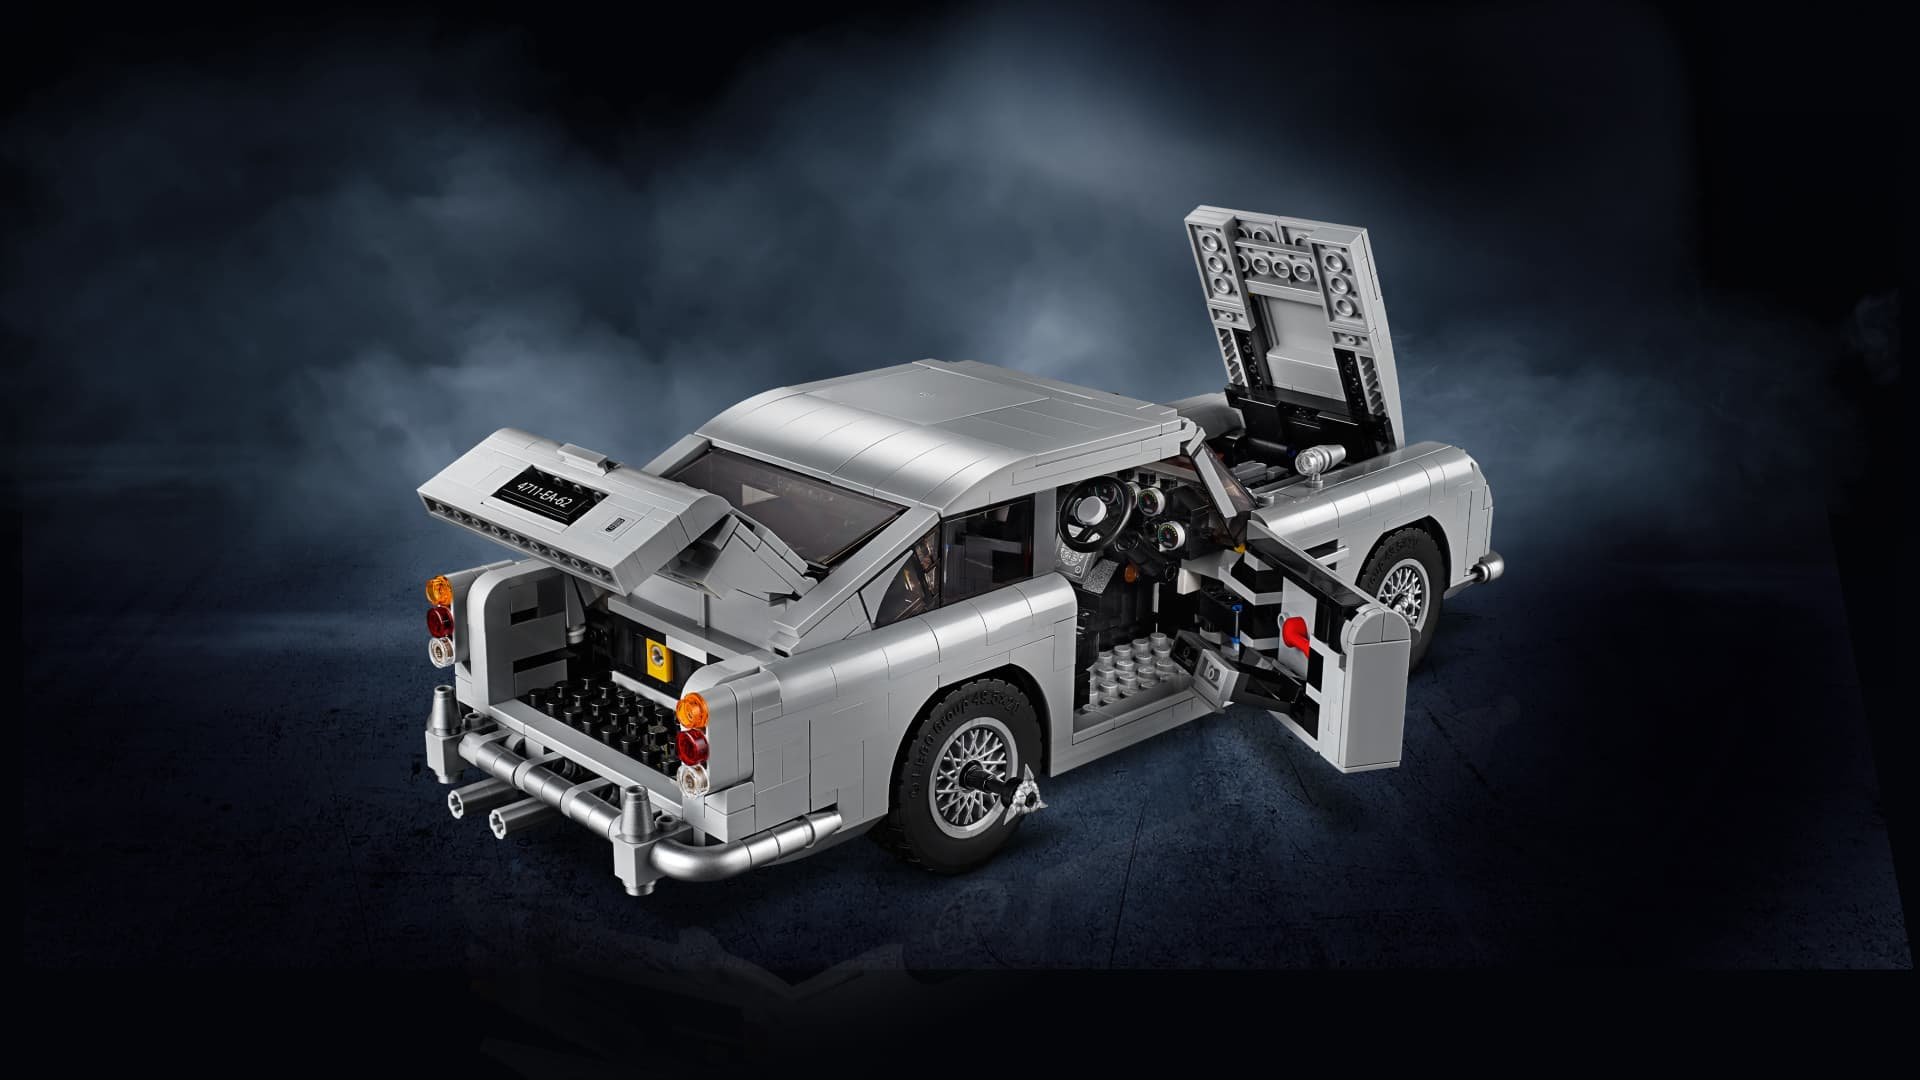 Lego Aston Martin Db5 Dm 7